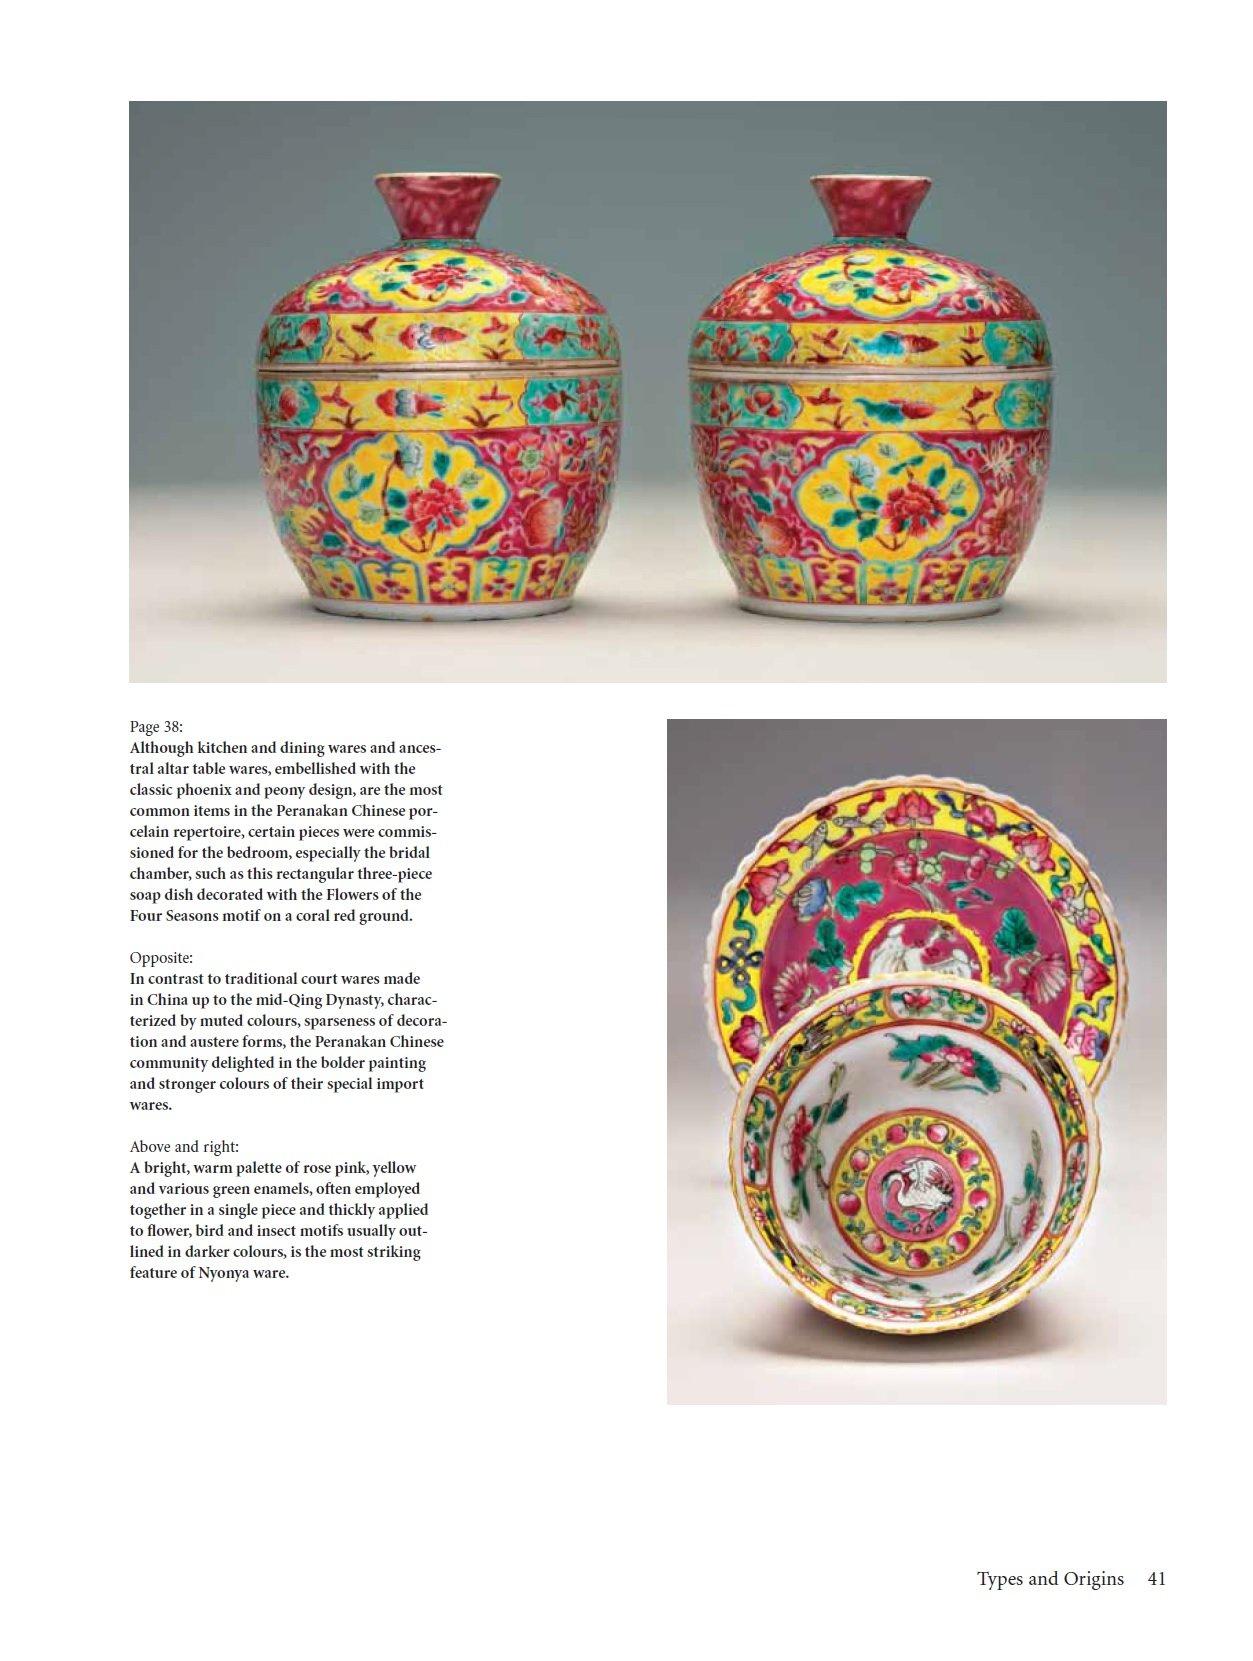 Peranakan chinese porcelain vibrant festive ware of the straits peranakan chinese porcelain vibrant festive ware of the straits chinese kee ming yuet lim hock seng 9780804848183 amazon books reviewsmspy